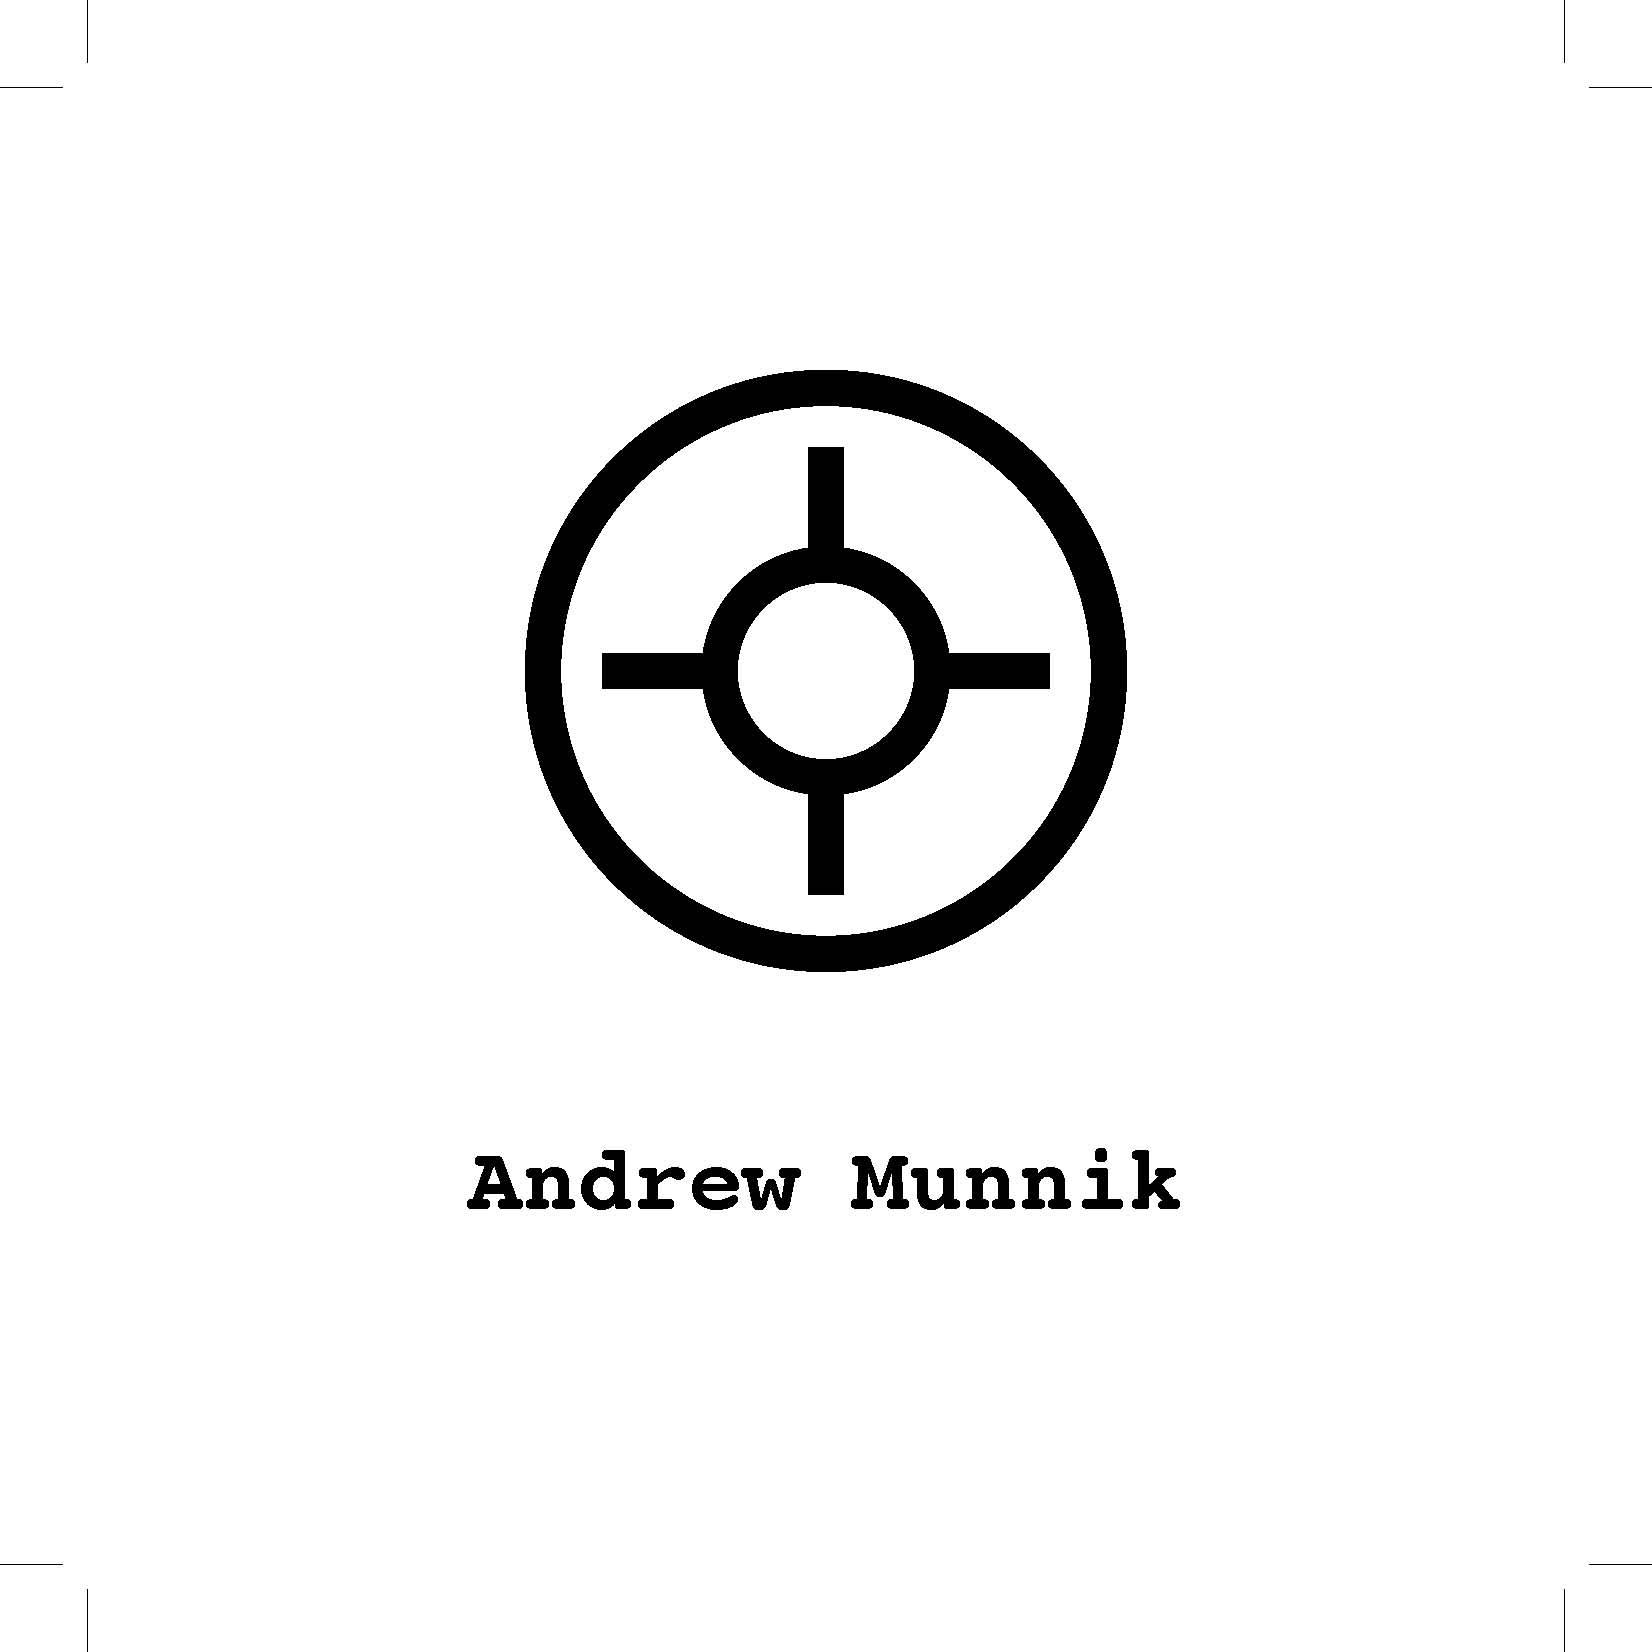 MAP Southafrica - Andrew Munnik